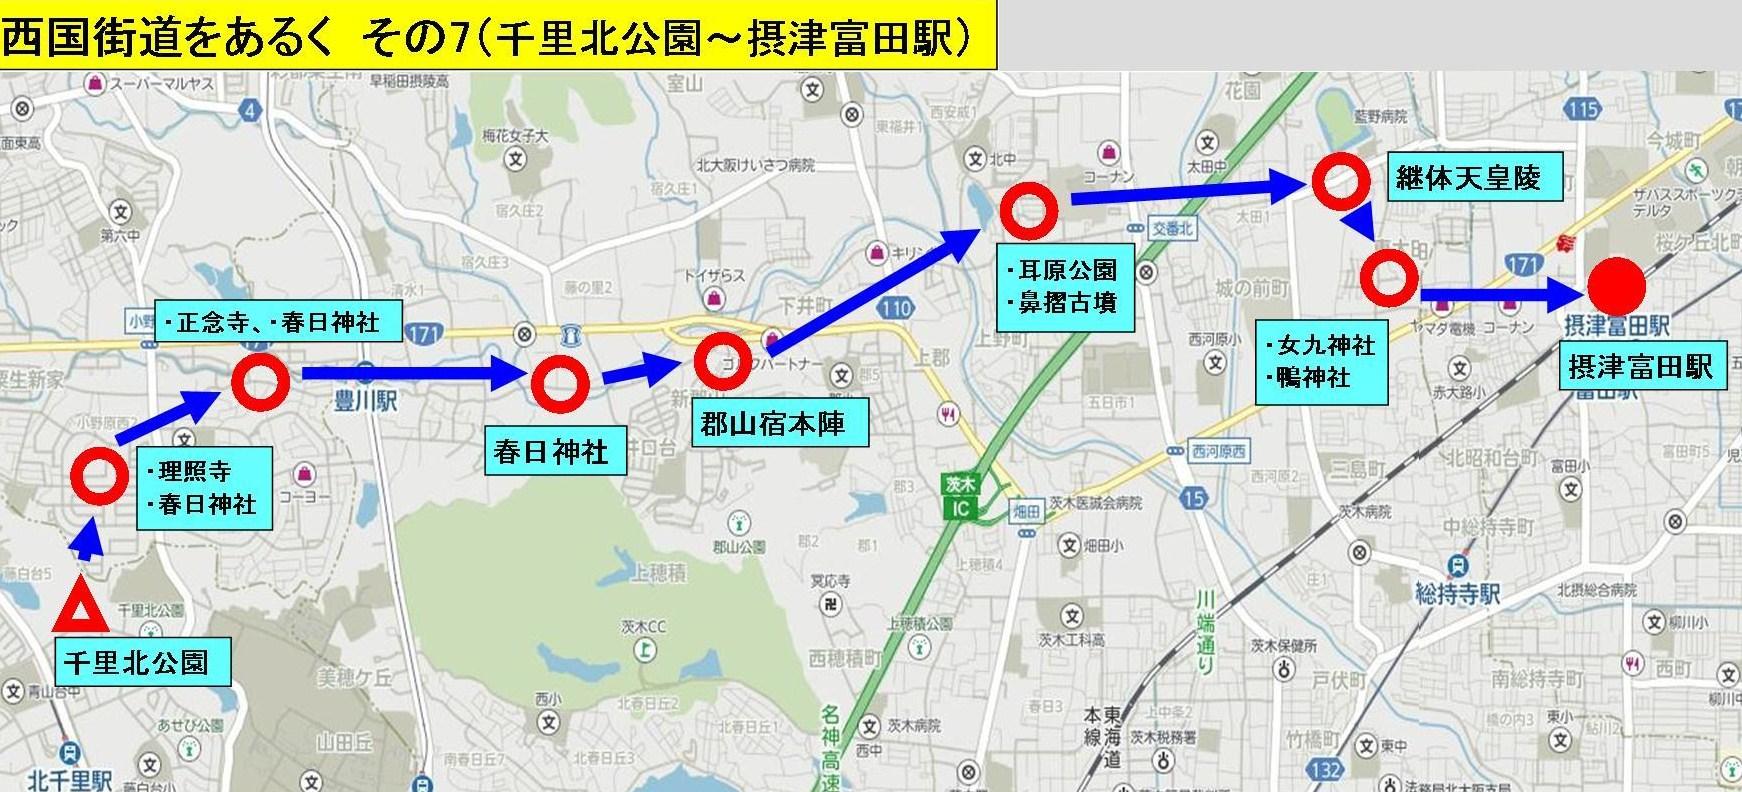 b地図block7.jpg